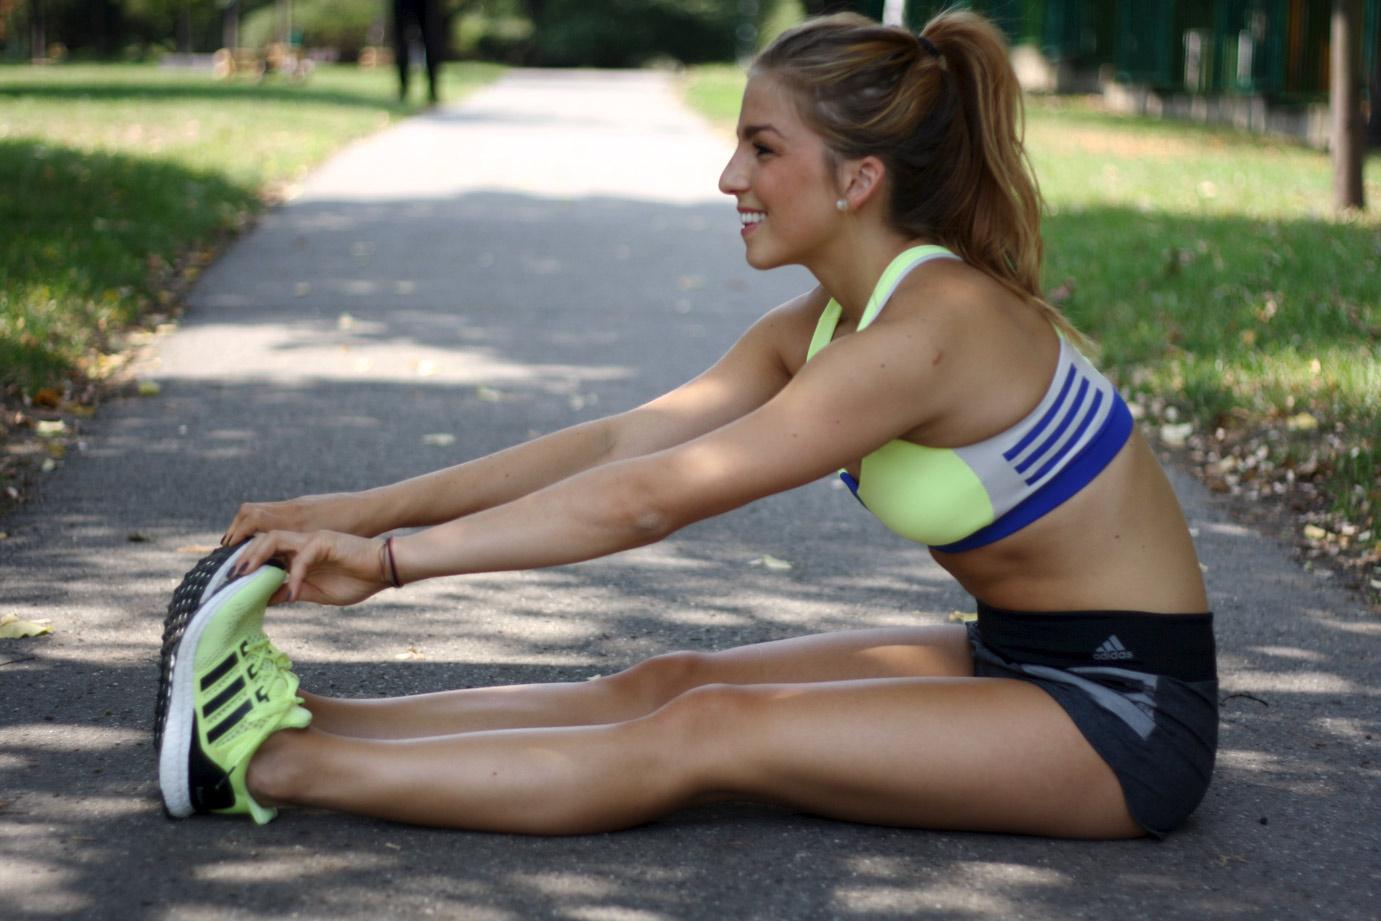 #ADIDASBLOGGERSCHALLENGE - THE BEST RUNNING OUTFIT 8